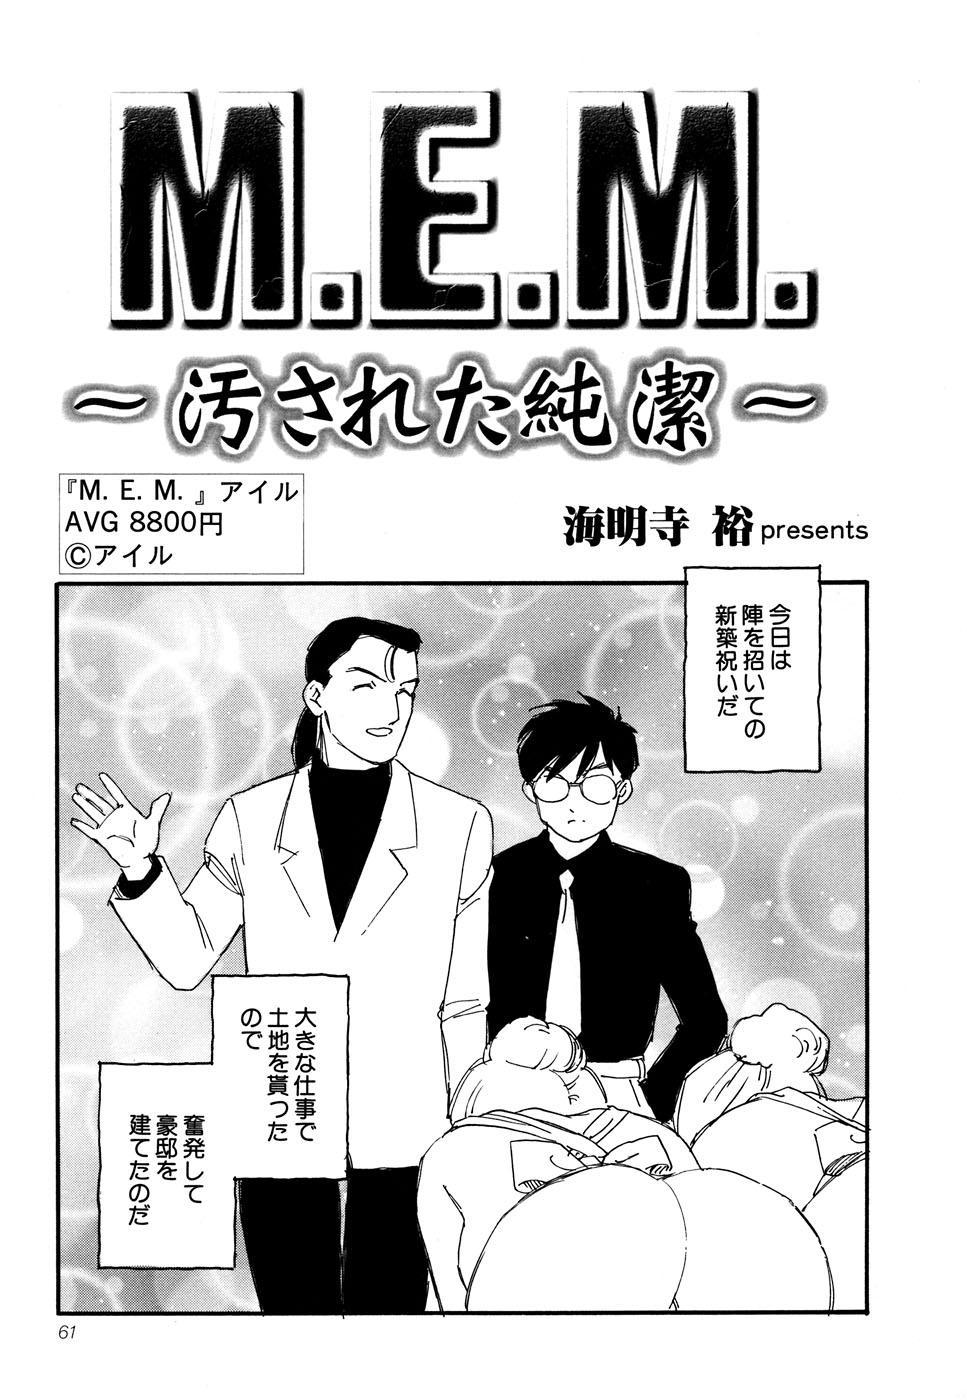 G-drive Vol.1 Ryoujokuhen 60